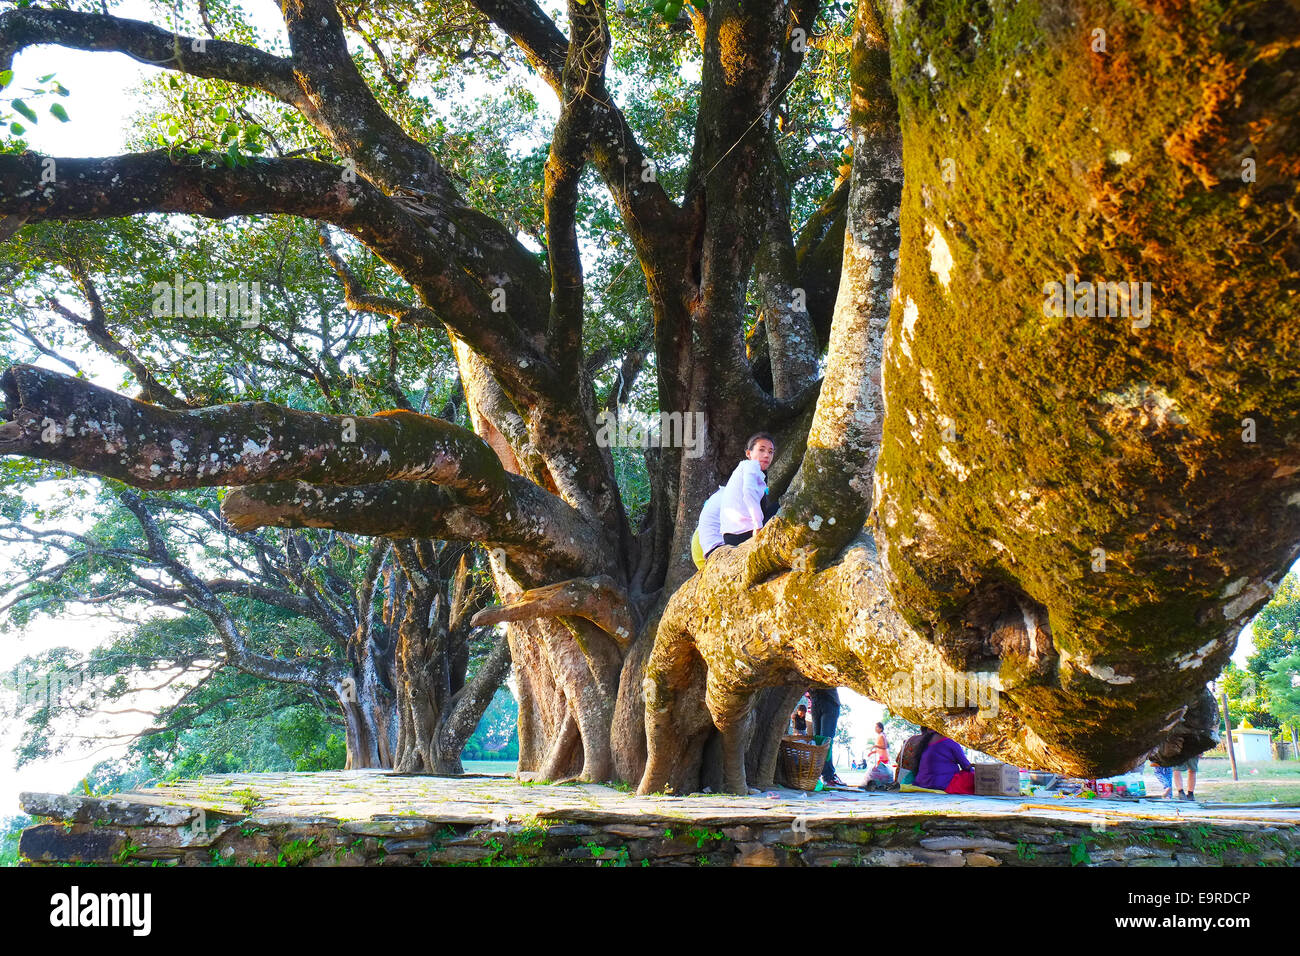 Kid sitting on gigantic tree. - Stock Image